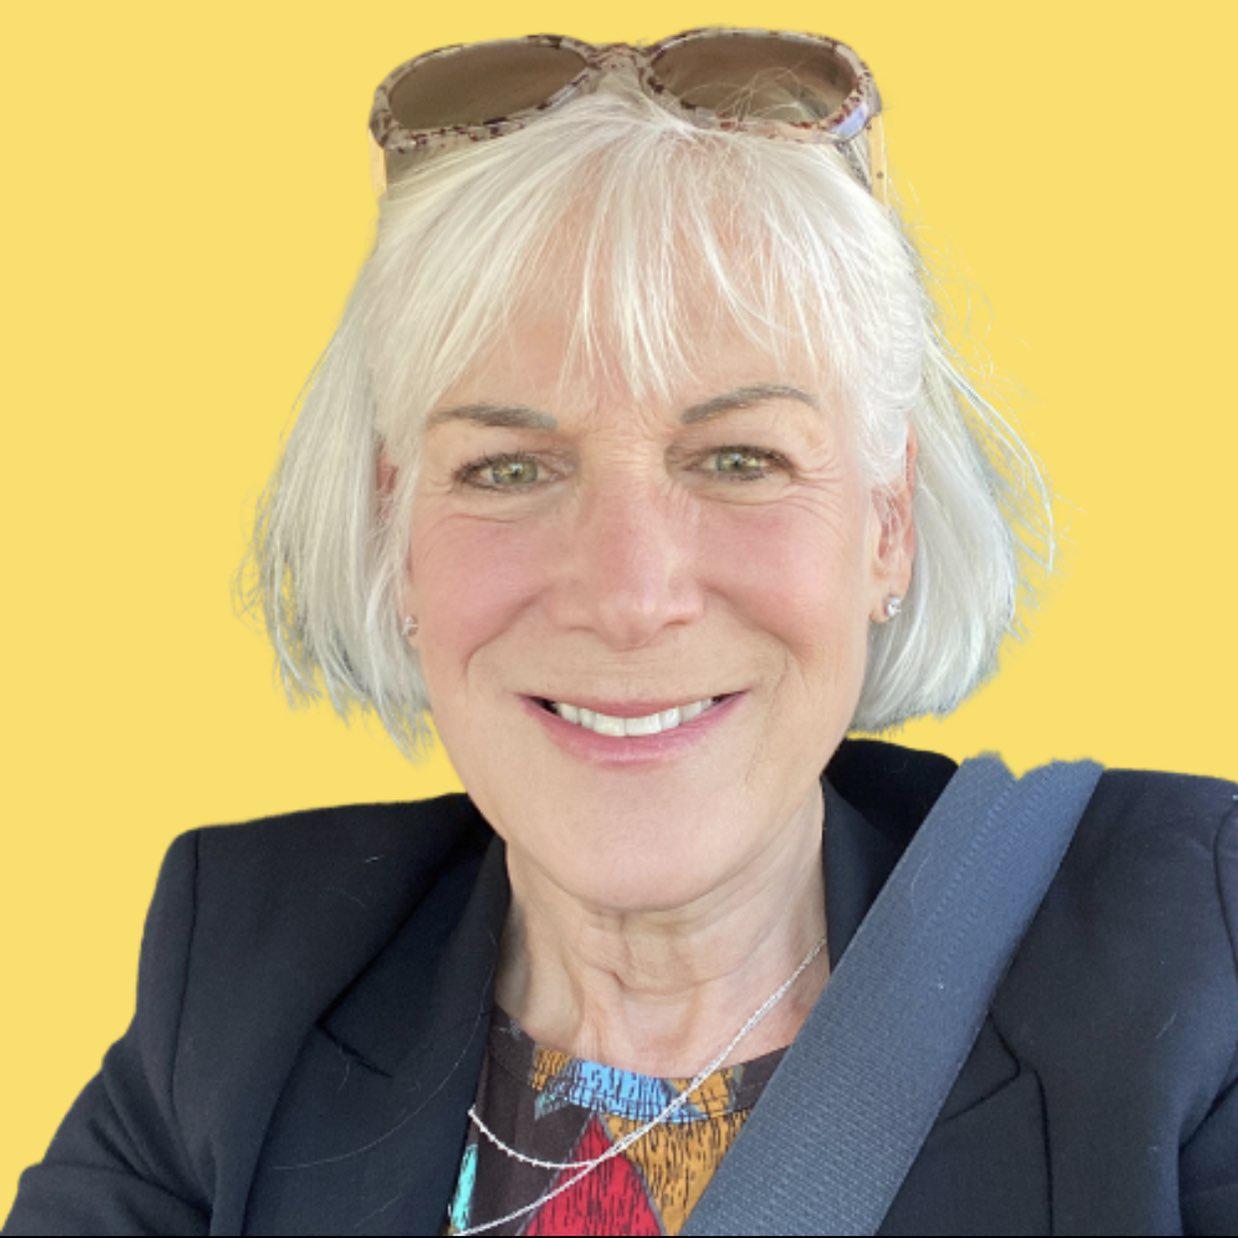 Susan Goodkind Wideman Clubhouse